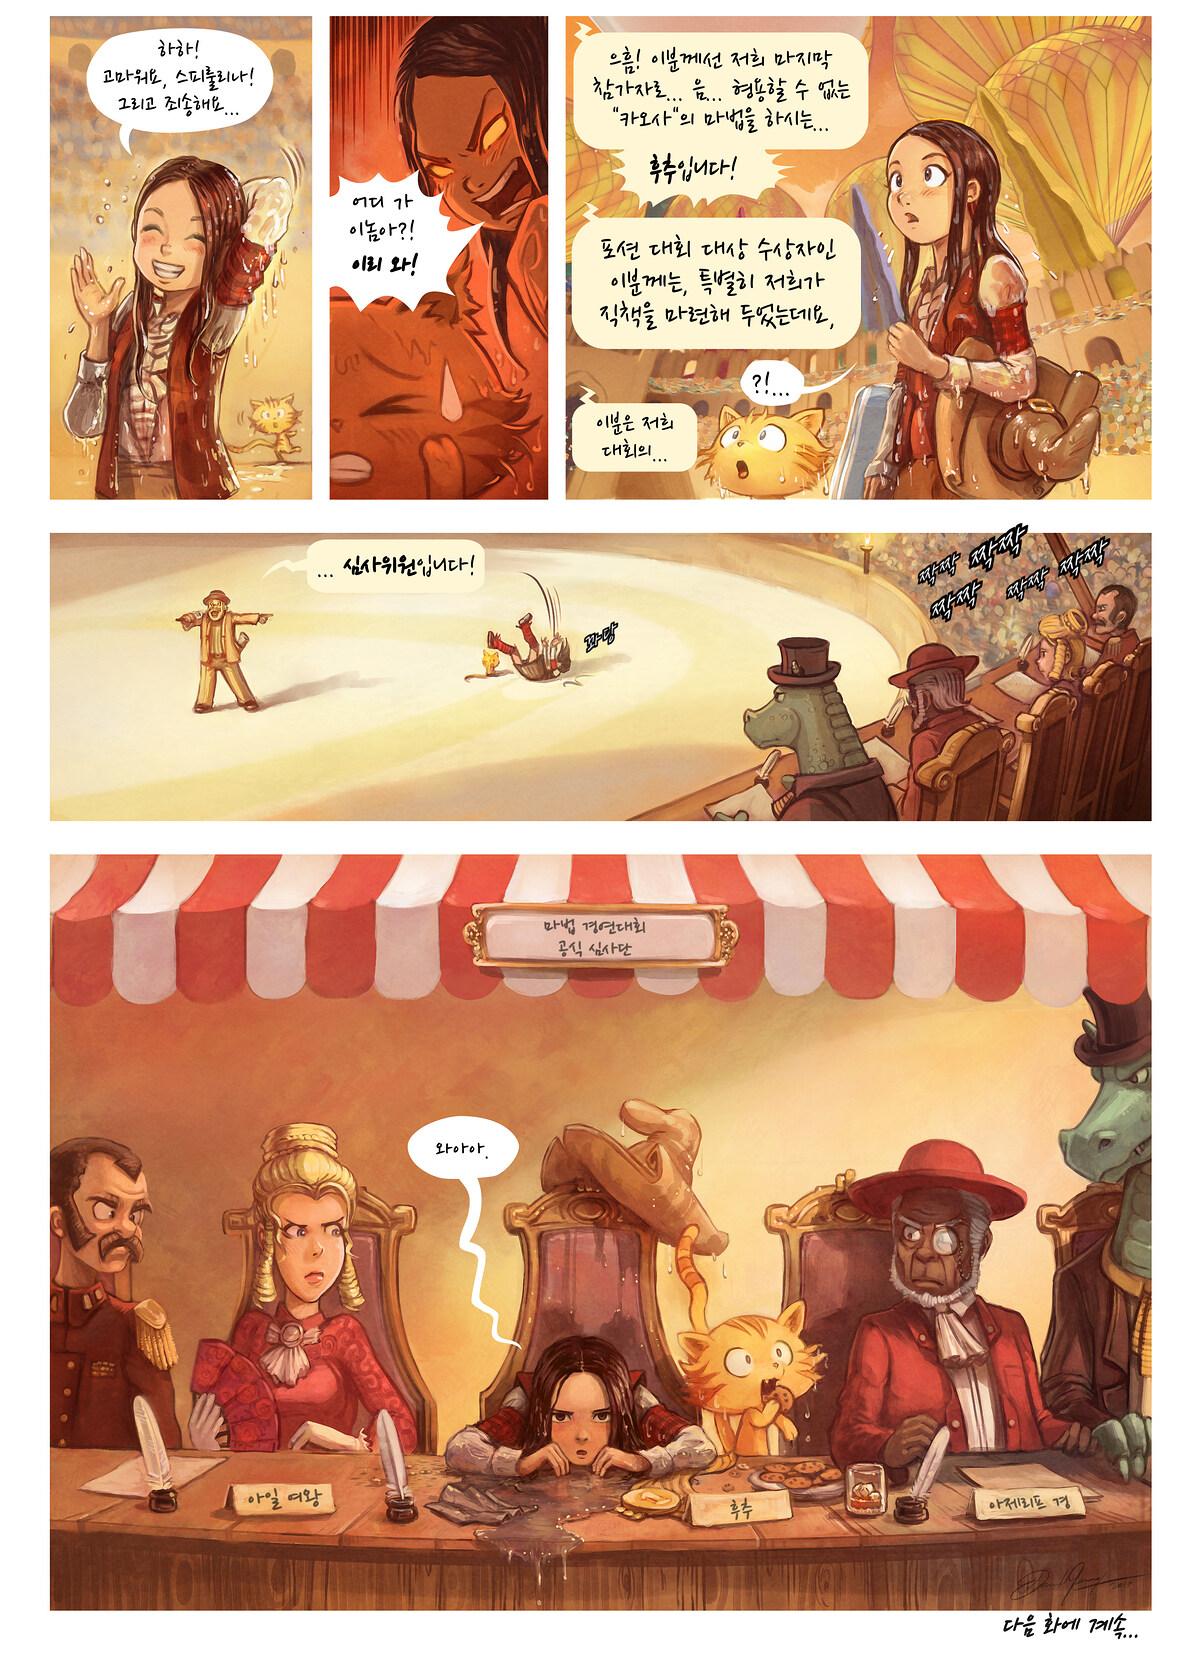 A webcomic page of Pepper&Carrot, 에피소드 21 [kr], 페이지 7